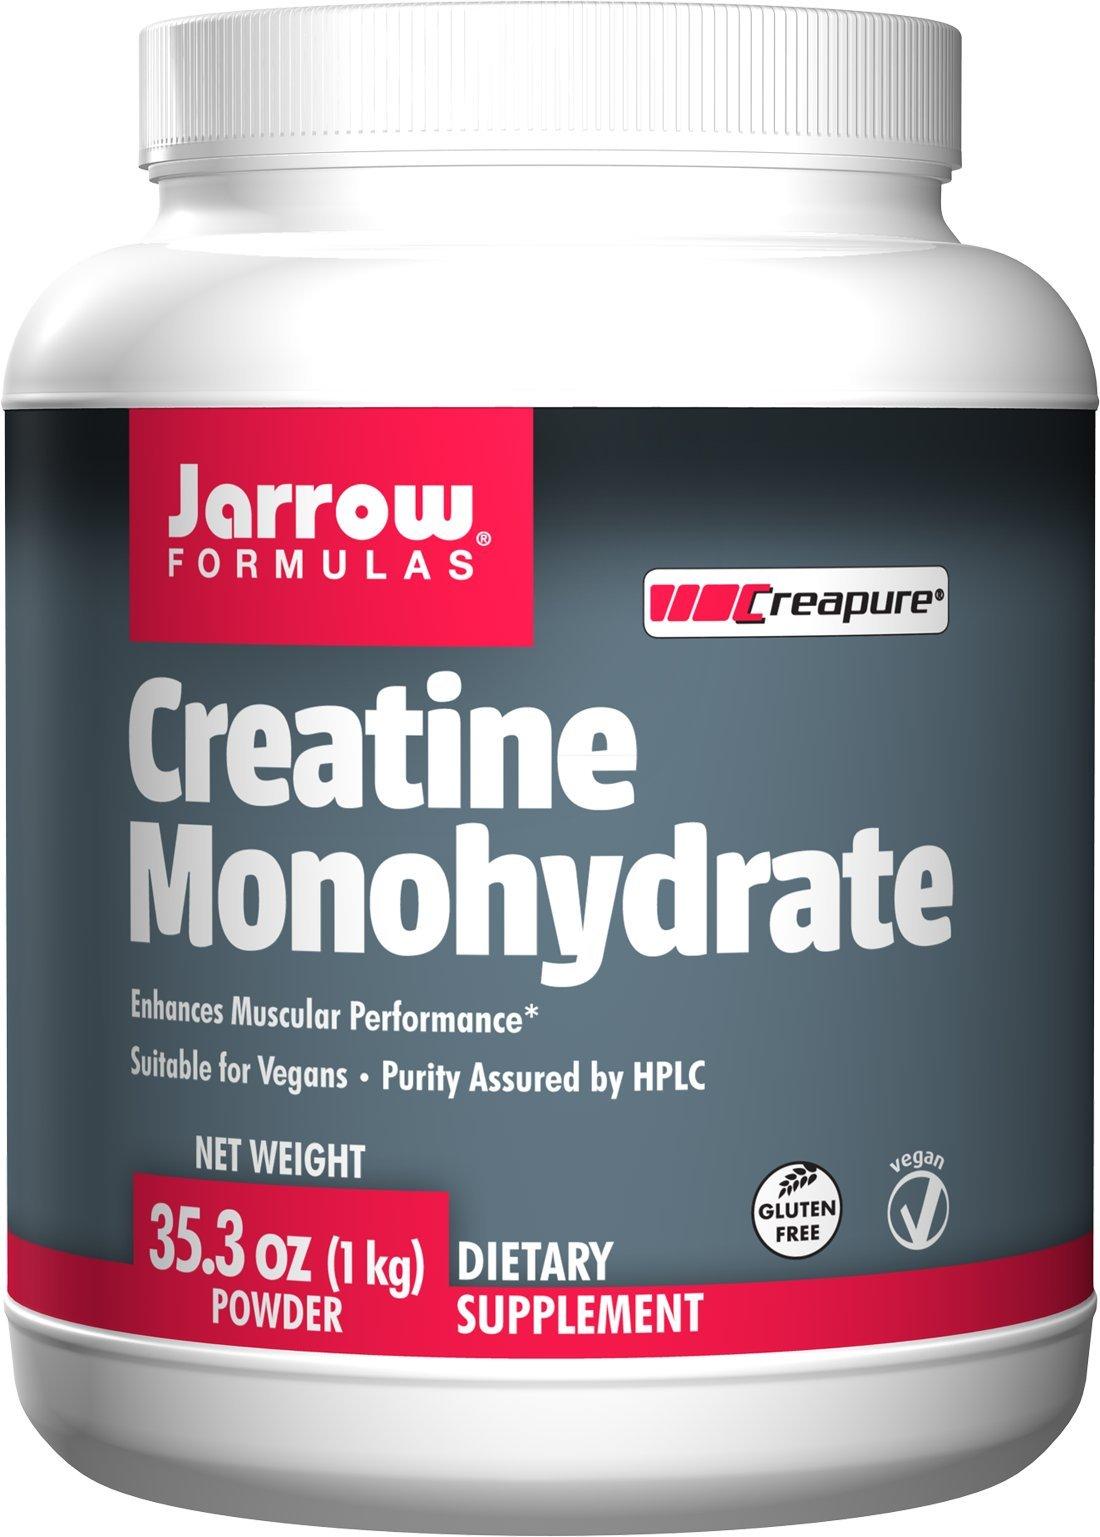 Jarrow Formulas - Creatine Monohydrate Powder -  35.3oz (1 kg)